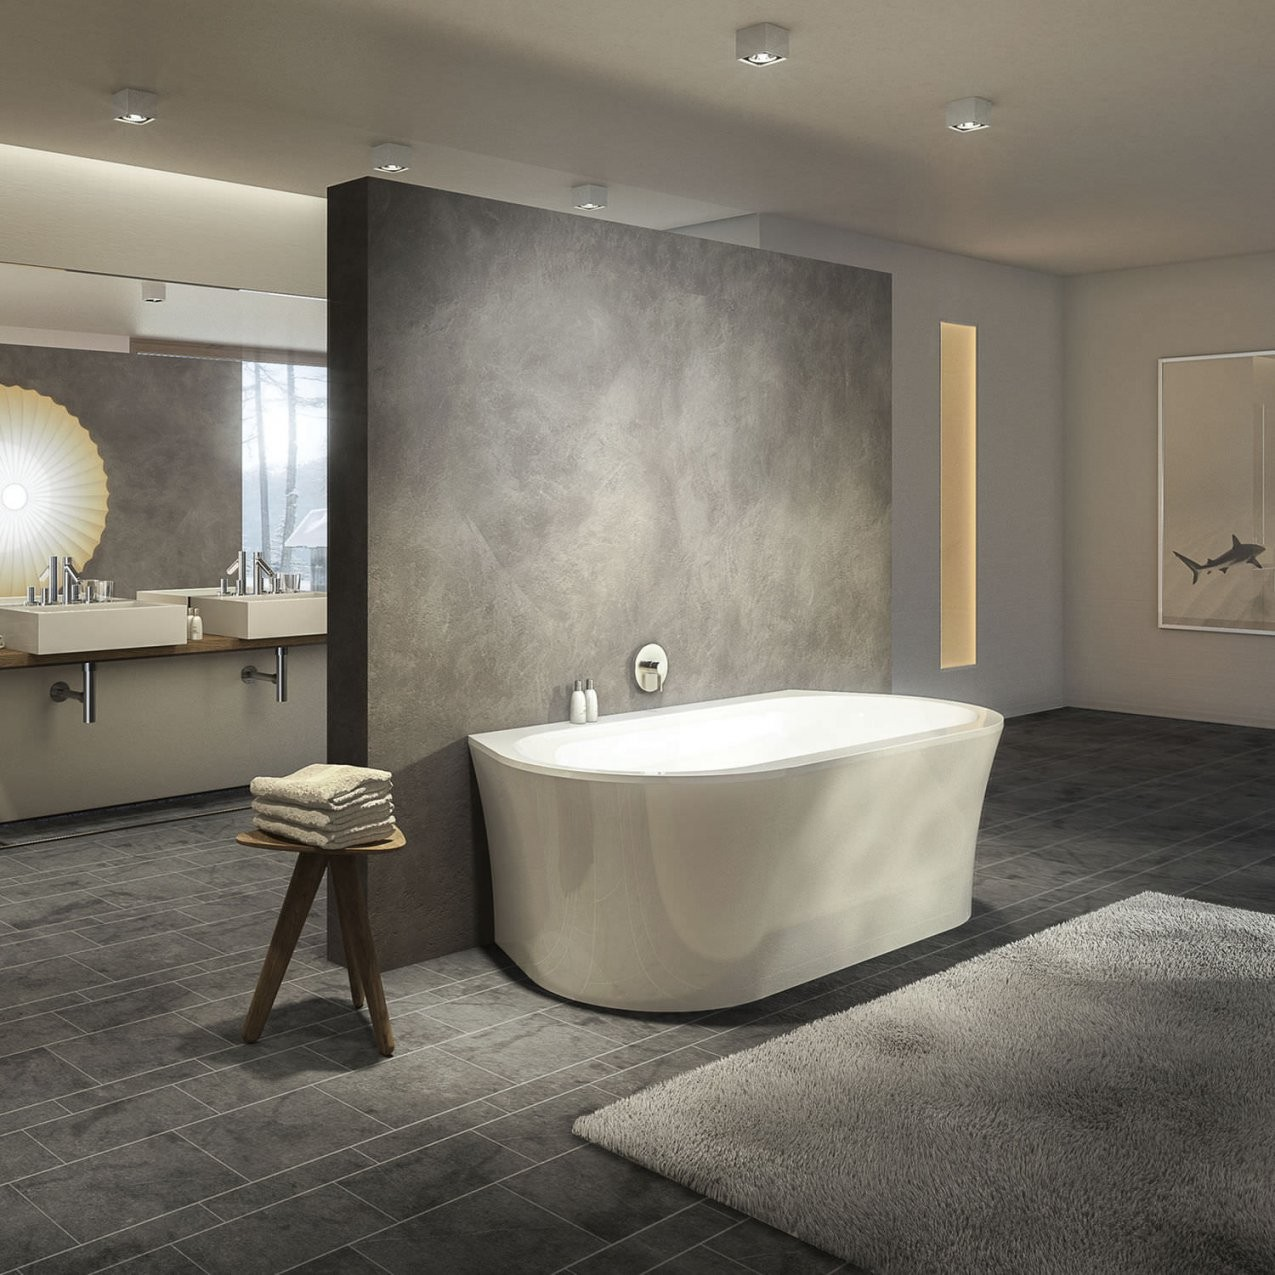 Freistehende Badewanne  Oval  Aus Acryl  Primeline Wall von Freistehende Badewanne An Der Wand Bild